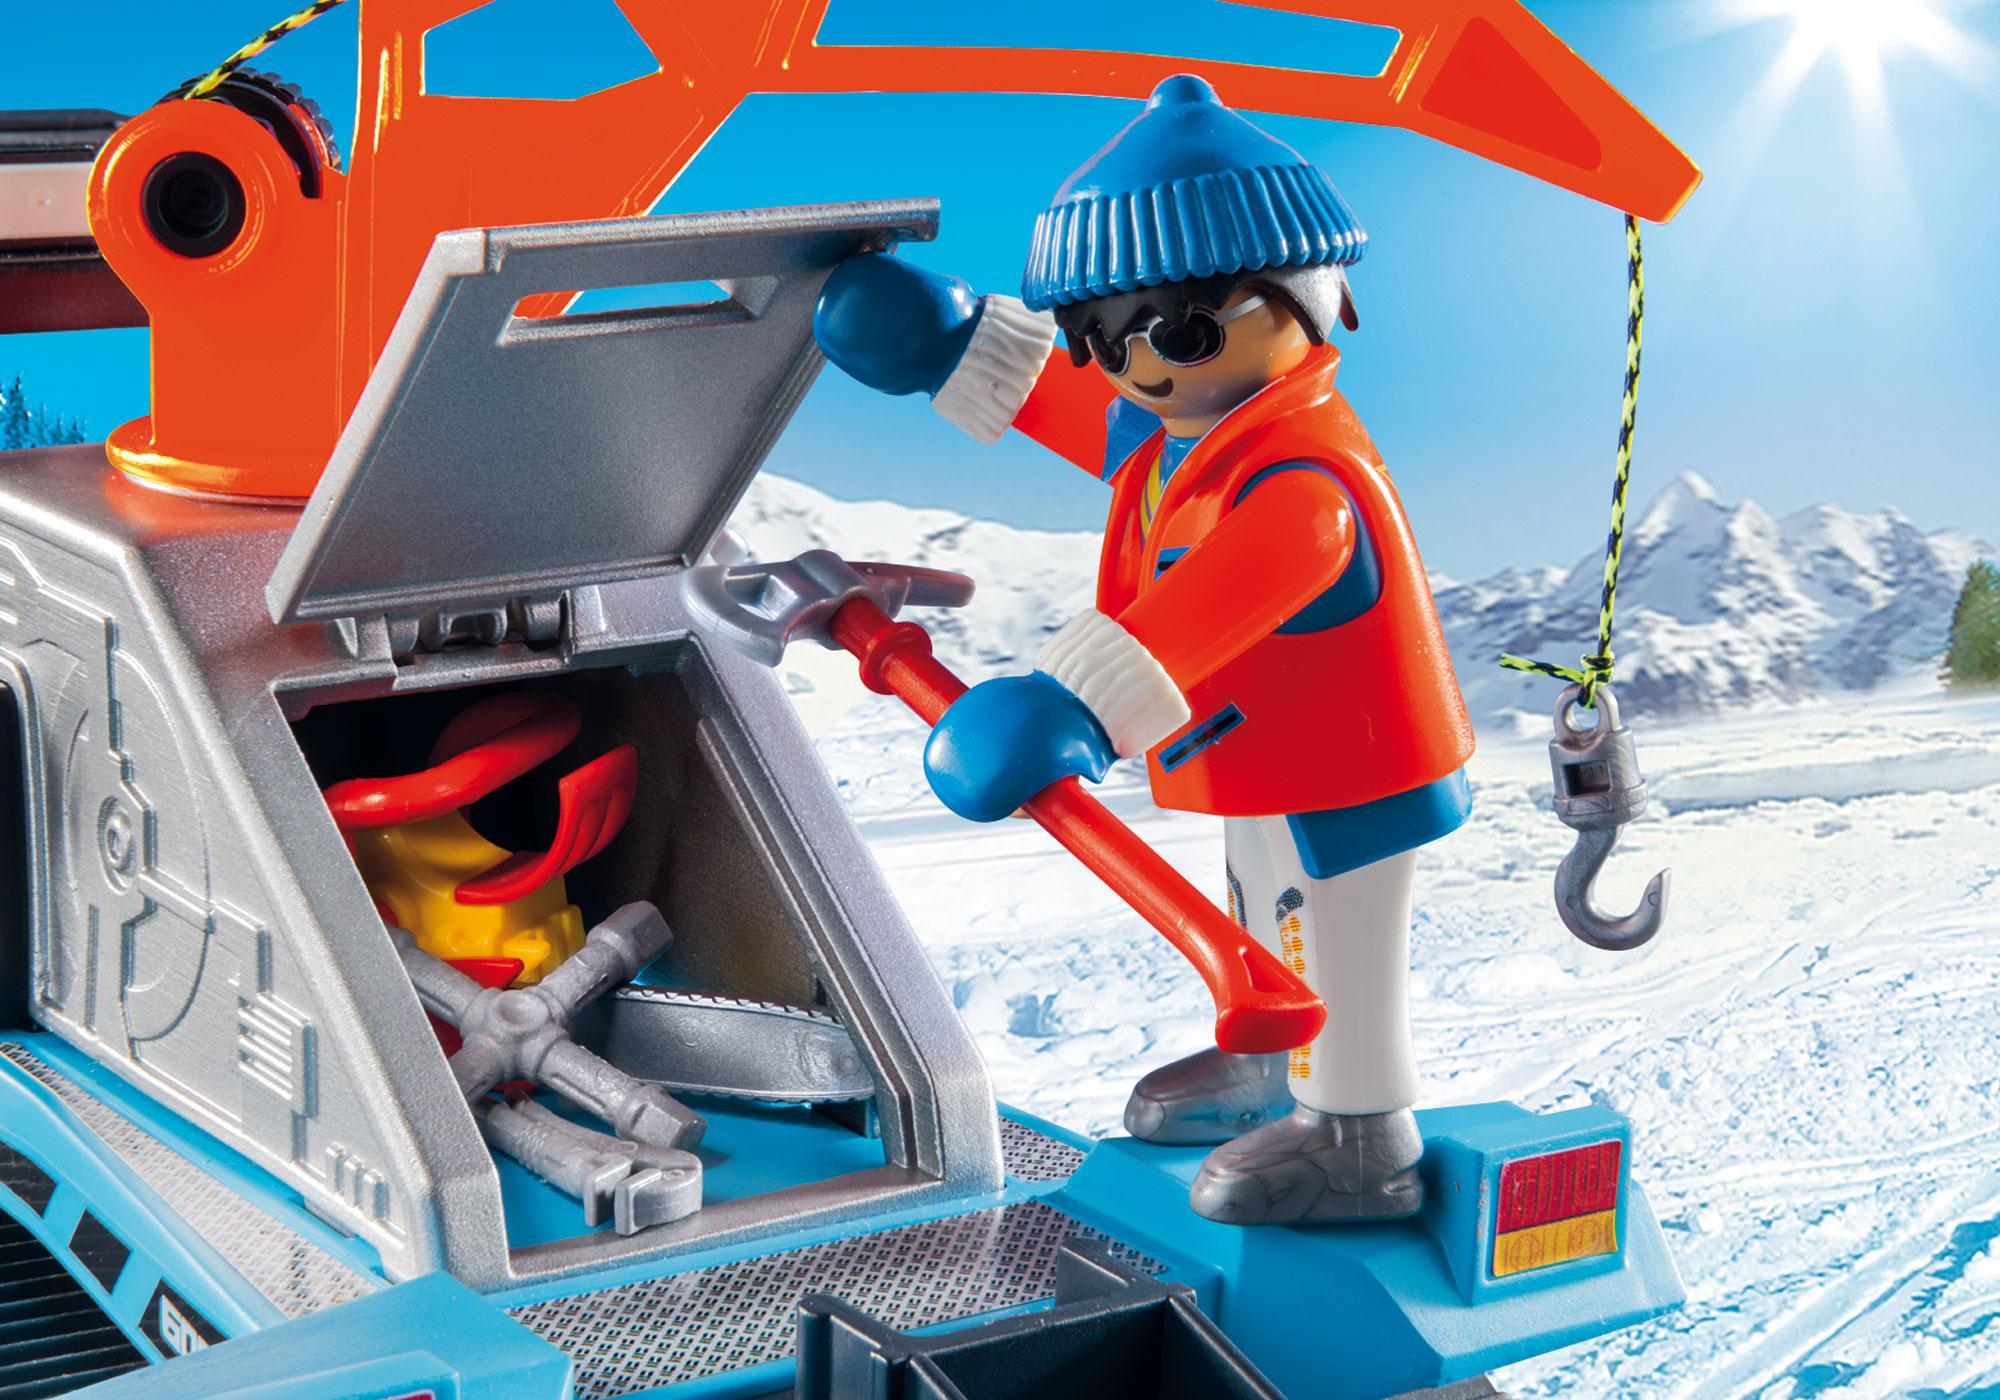 http://media.playmobil.com/i/playmobil/9500_product_extra1/Snow Plow